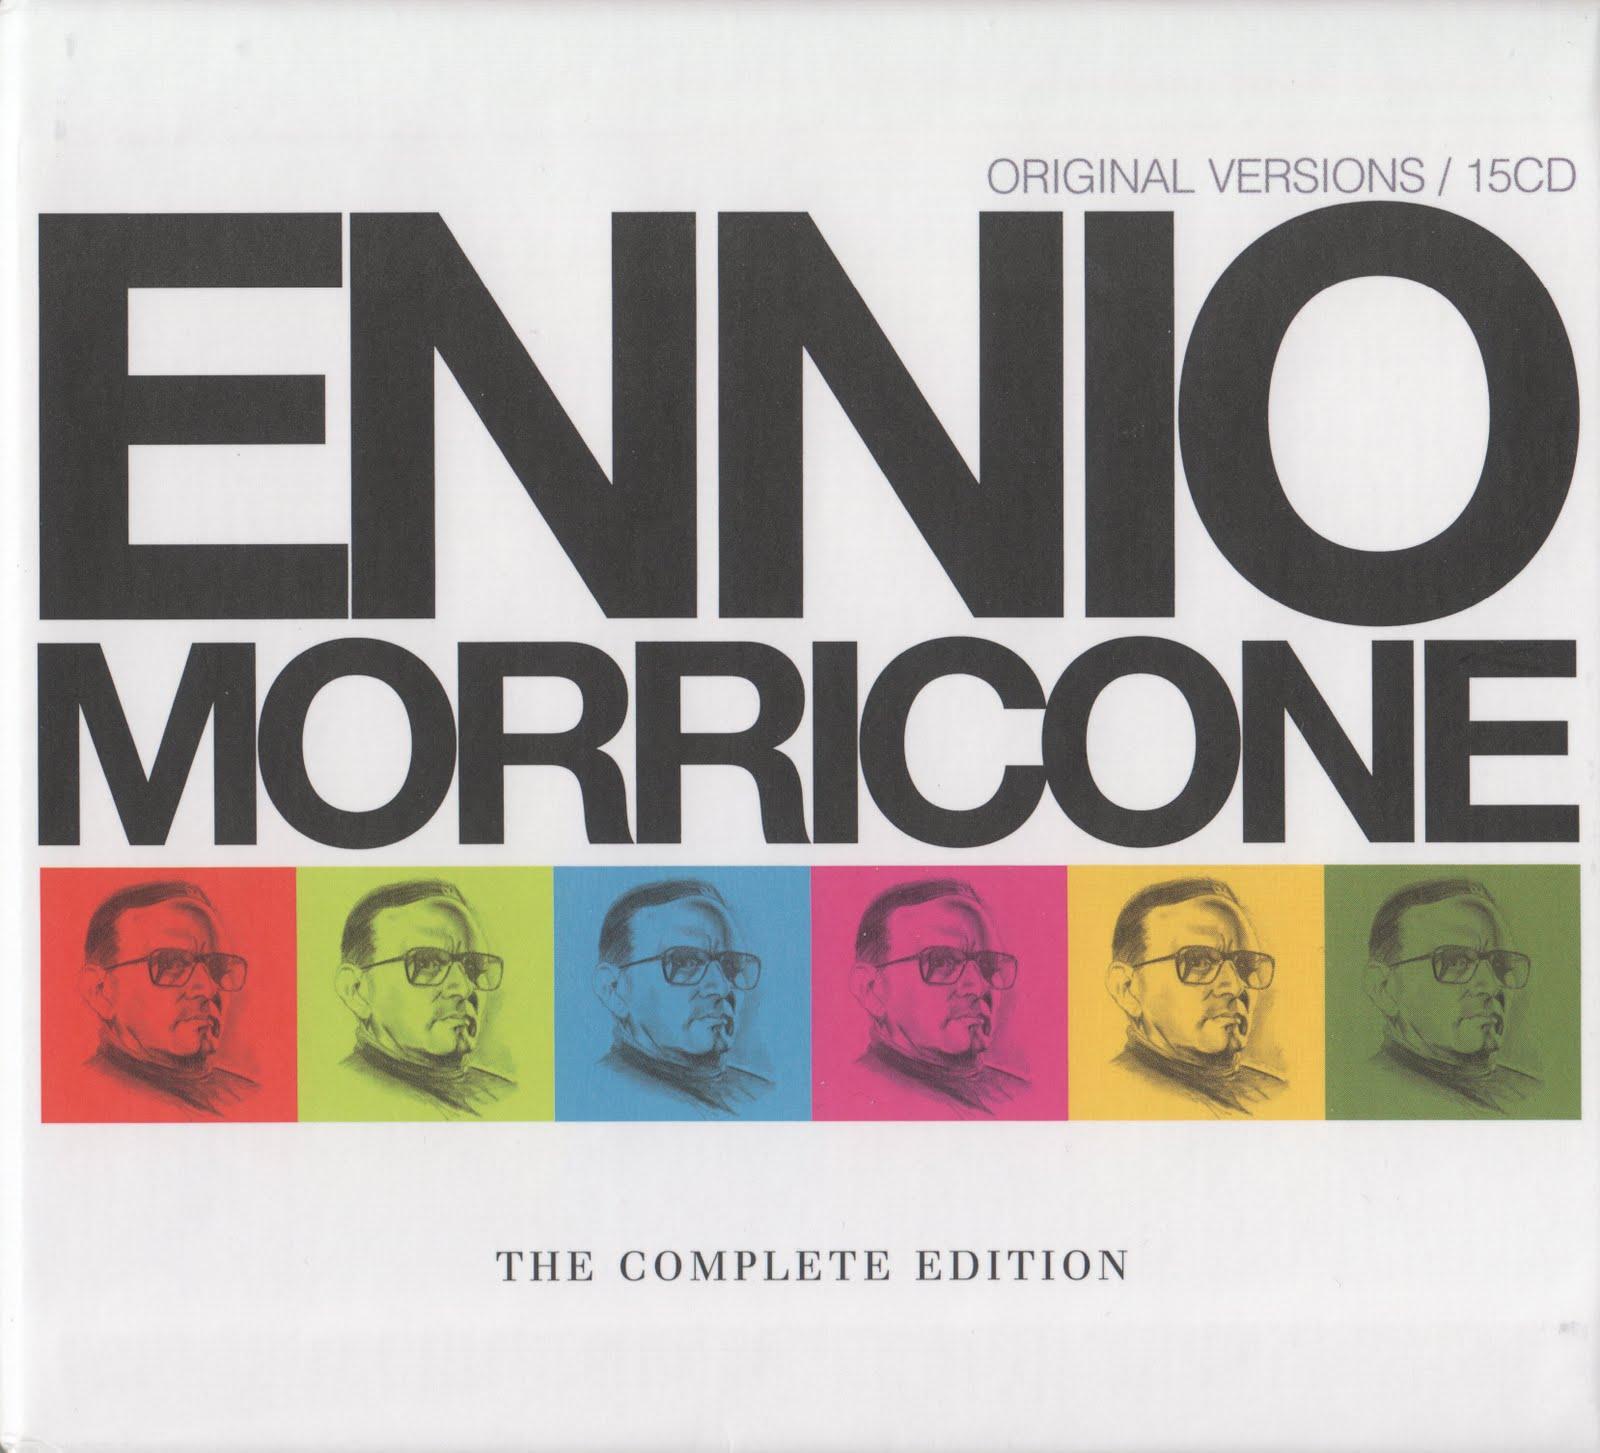 http://3.bp.blogspot.com/_XOTJ5x6oyfI/TSfGHpvgQNI/AAAAAAAAHnE/HJo0y2il35A/s1600/Ennio+Morricone+-+The+Complete+Edition+%25282008%2529++1.jpg